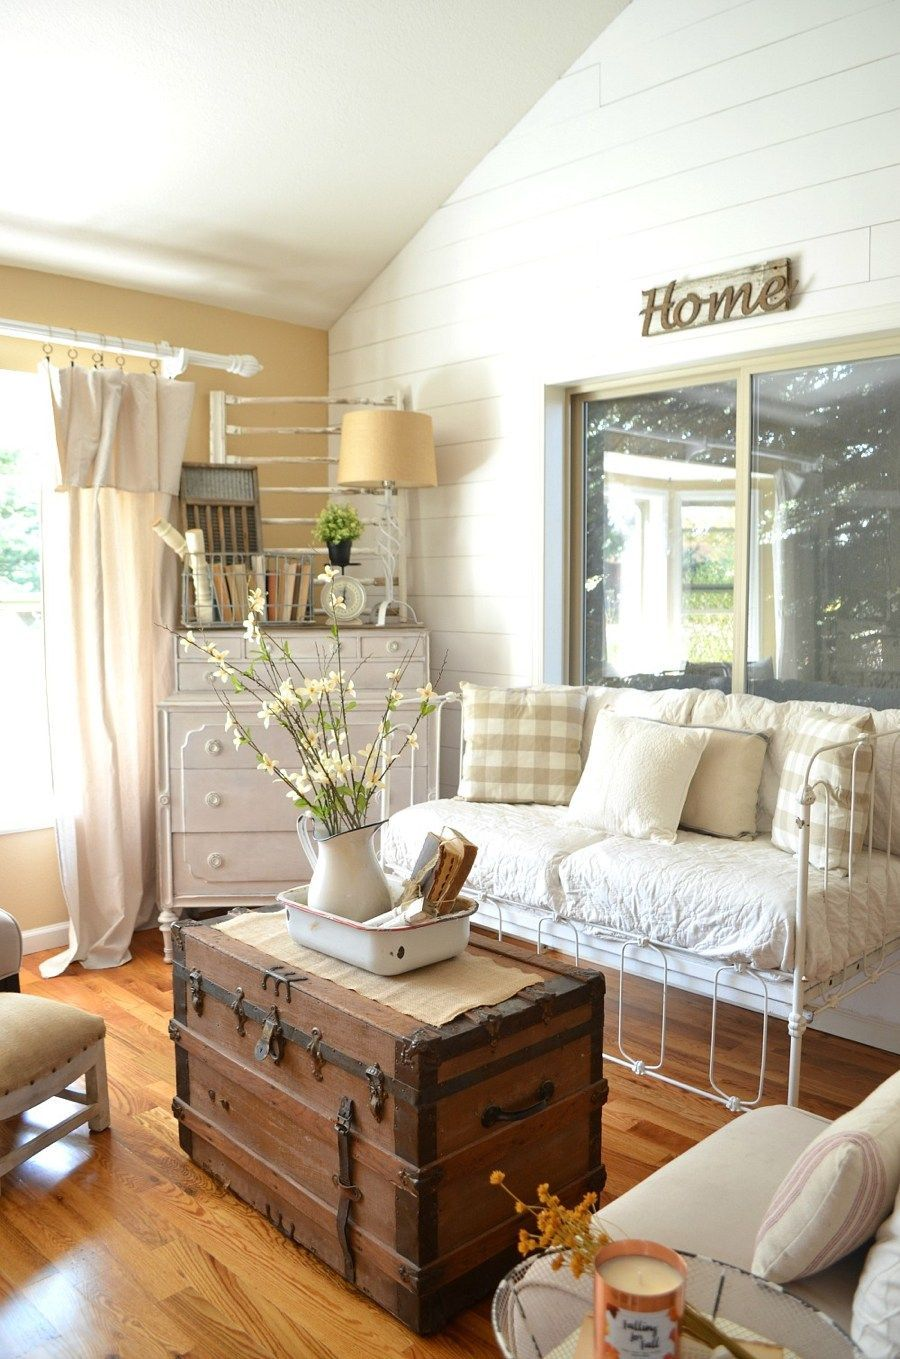 27 Rustic Farmhouse Living Room Decor Ideas For Your Home Farmhouse Decor Living Room Farm House Living Room Farmhouse Living Room Furniture